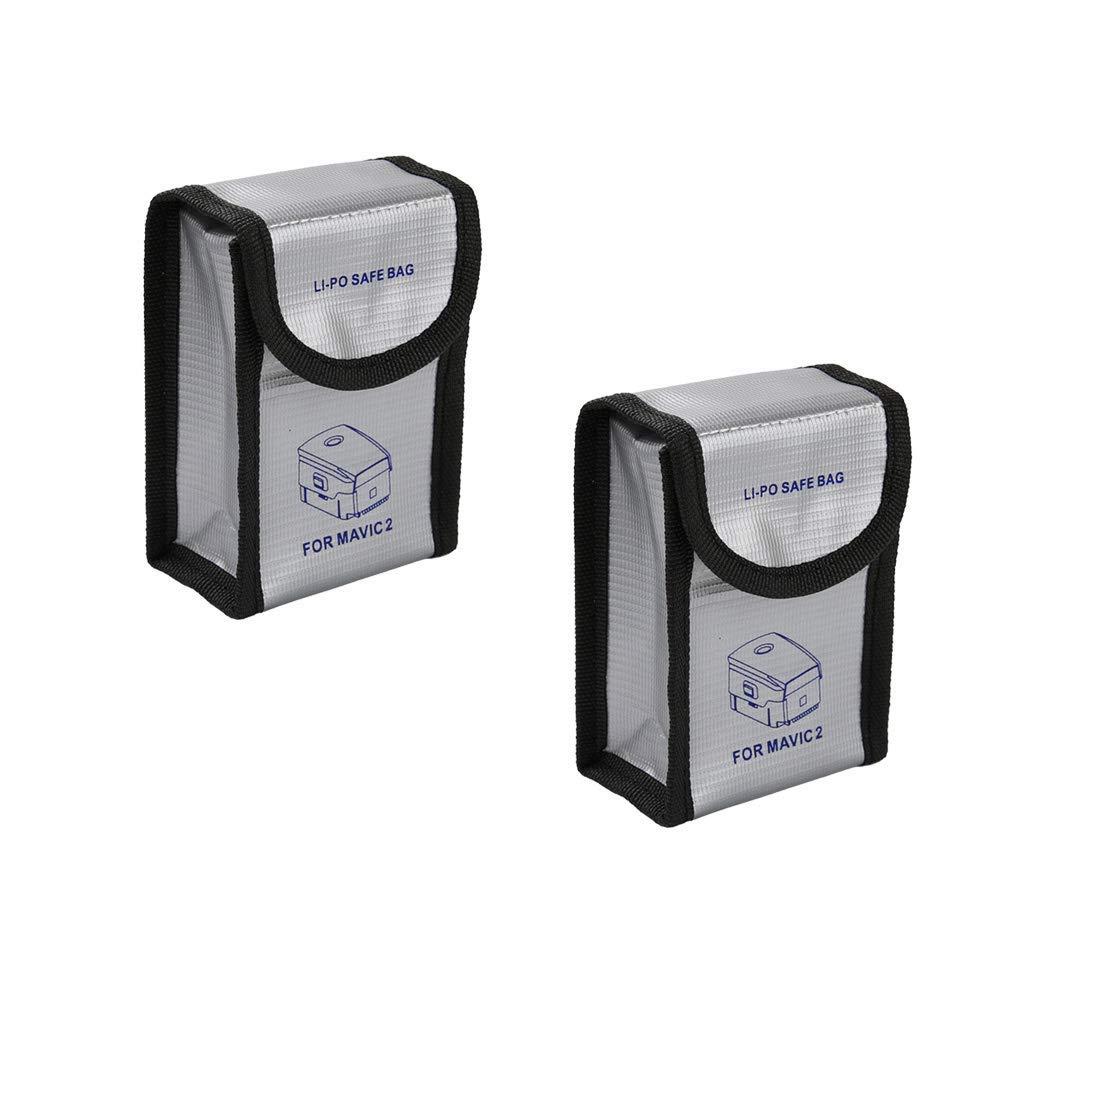 YIFAN 2PCS Lipo Battery Fireproof Explosionproof Bag for DJI Mavic 2 PRO/Mavic 2 Zoom, Accessories for DJI Mavic 2 Pro